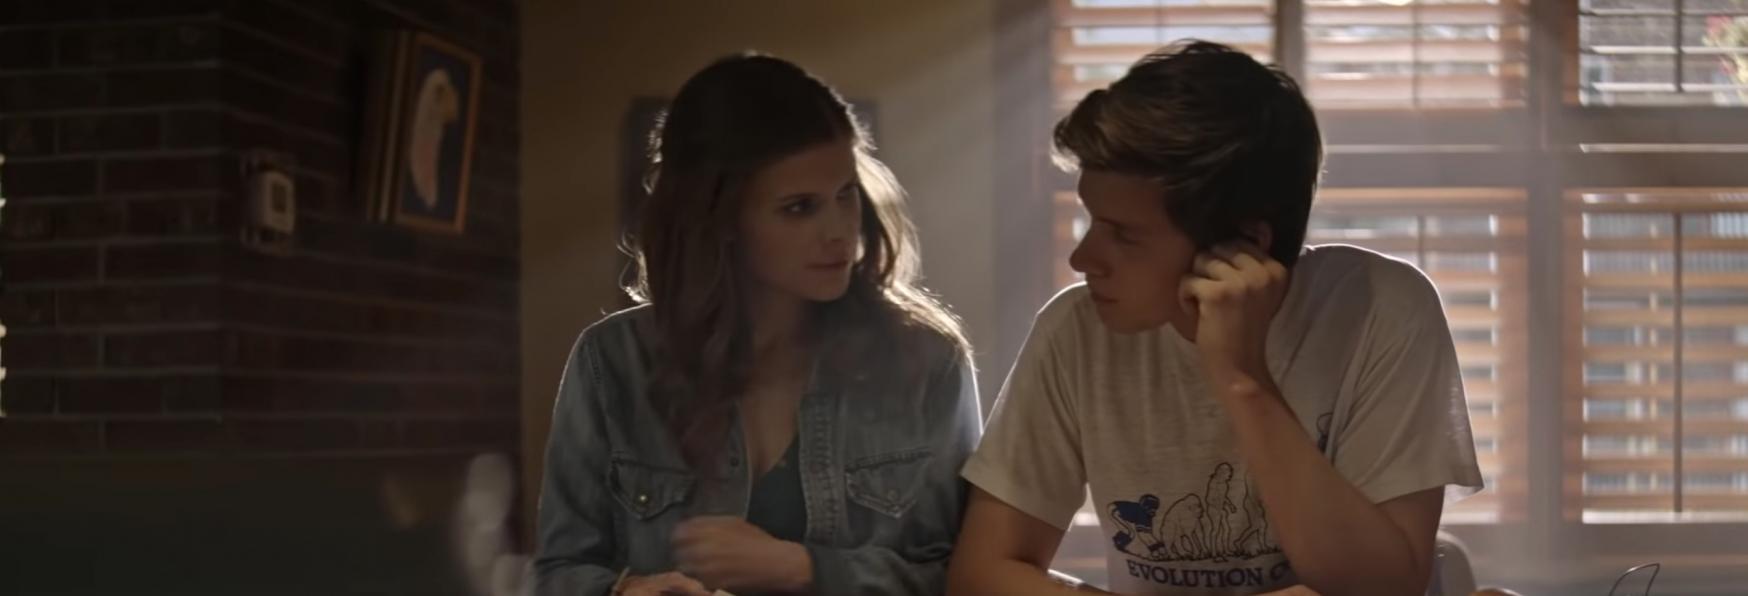 A Teacher: Trama, Cast, Data e Trailer della nuova Serie TV targata Hulu